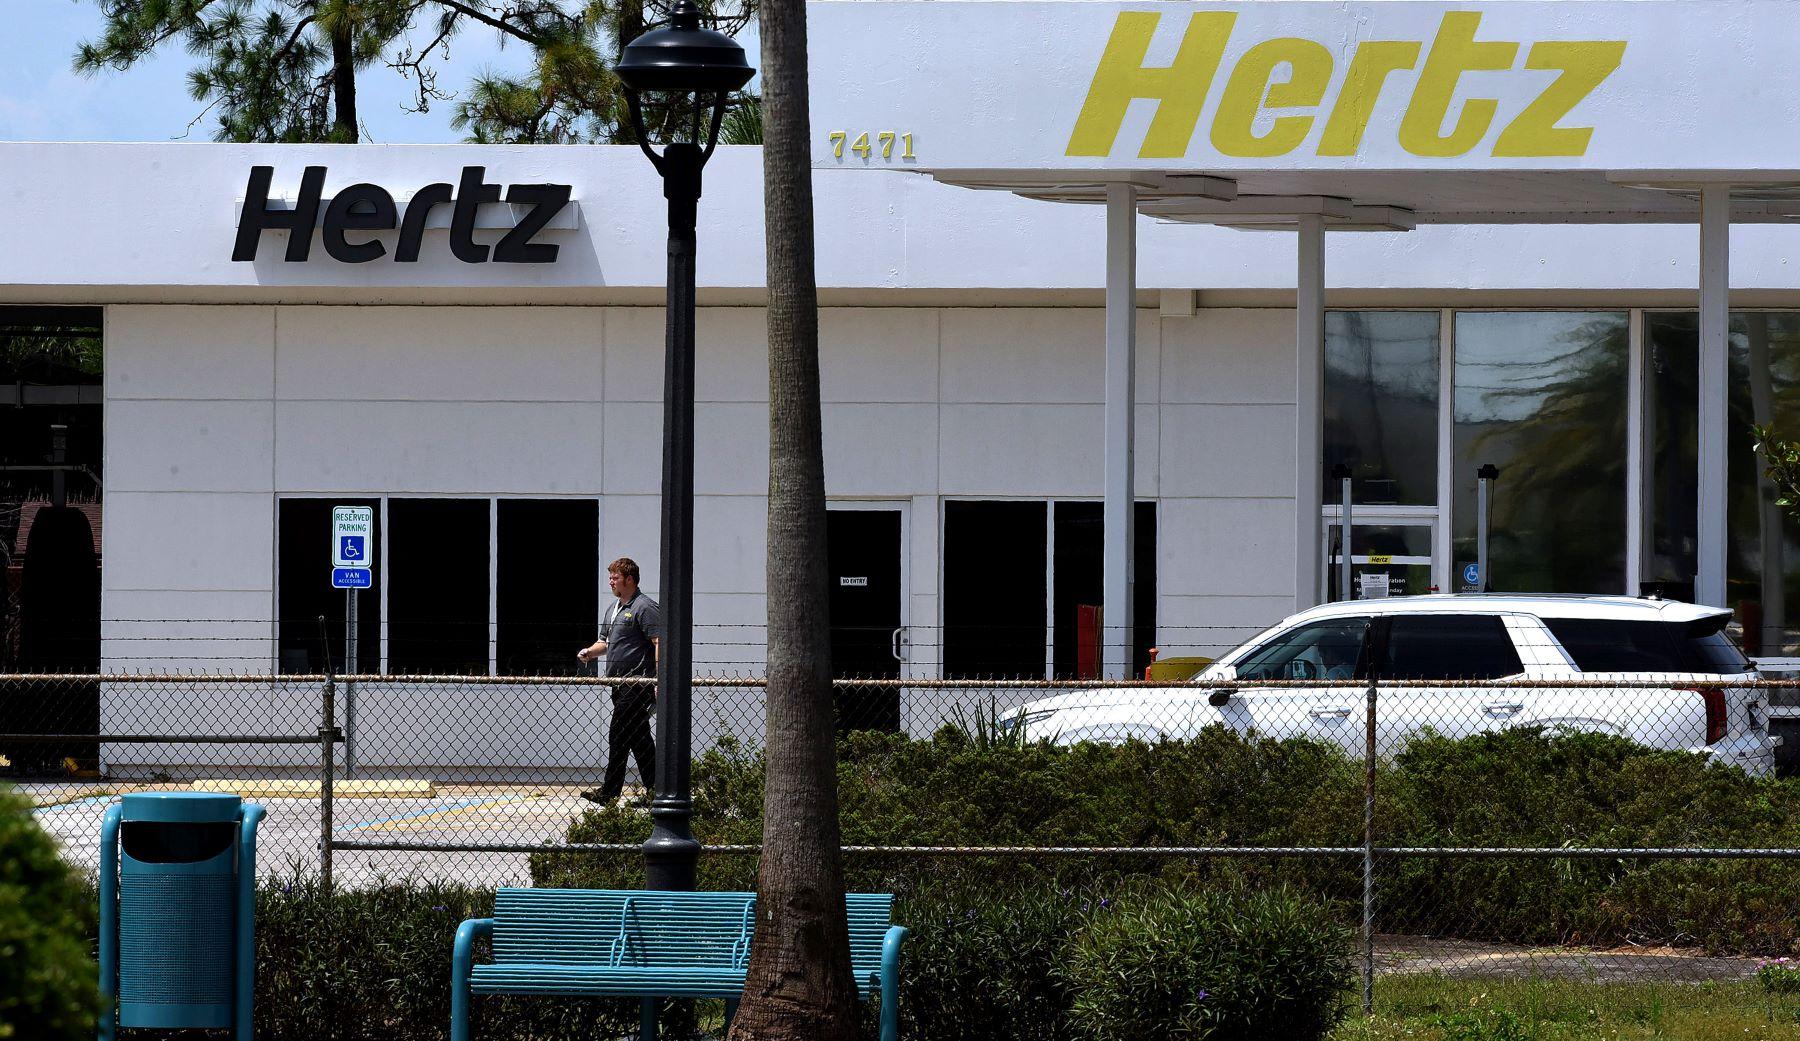 A Hertz car rental office in Kissimmee, Florida